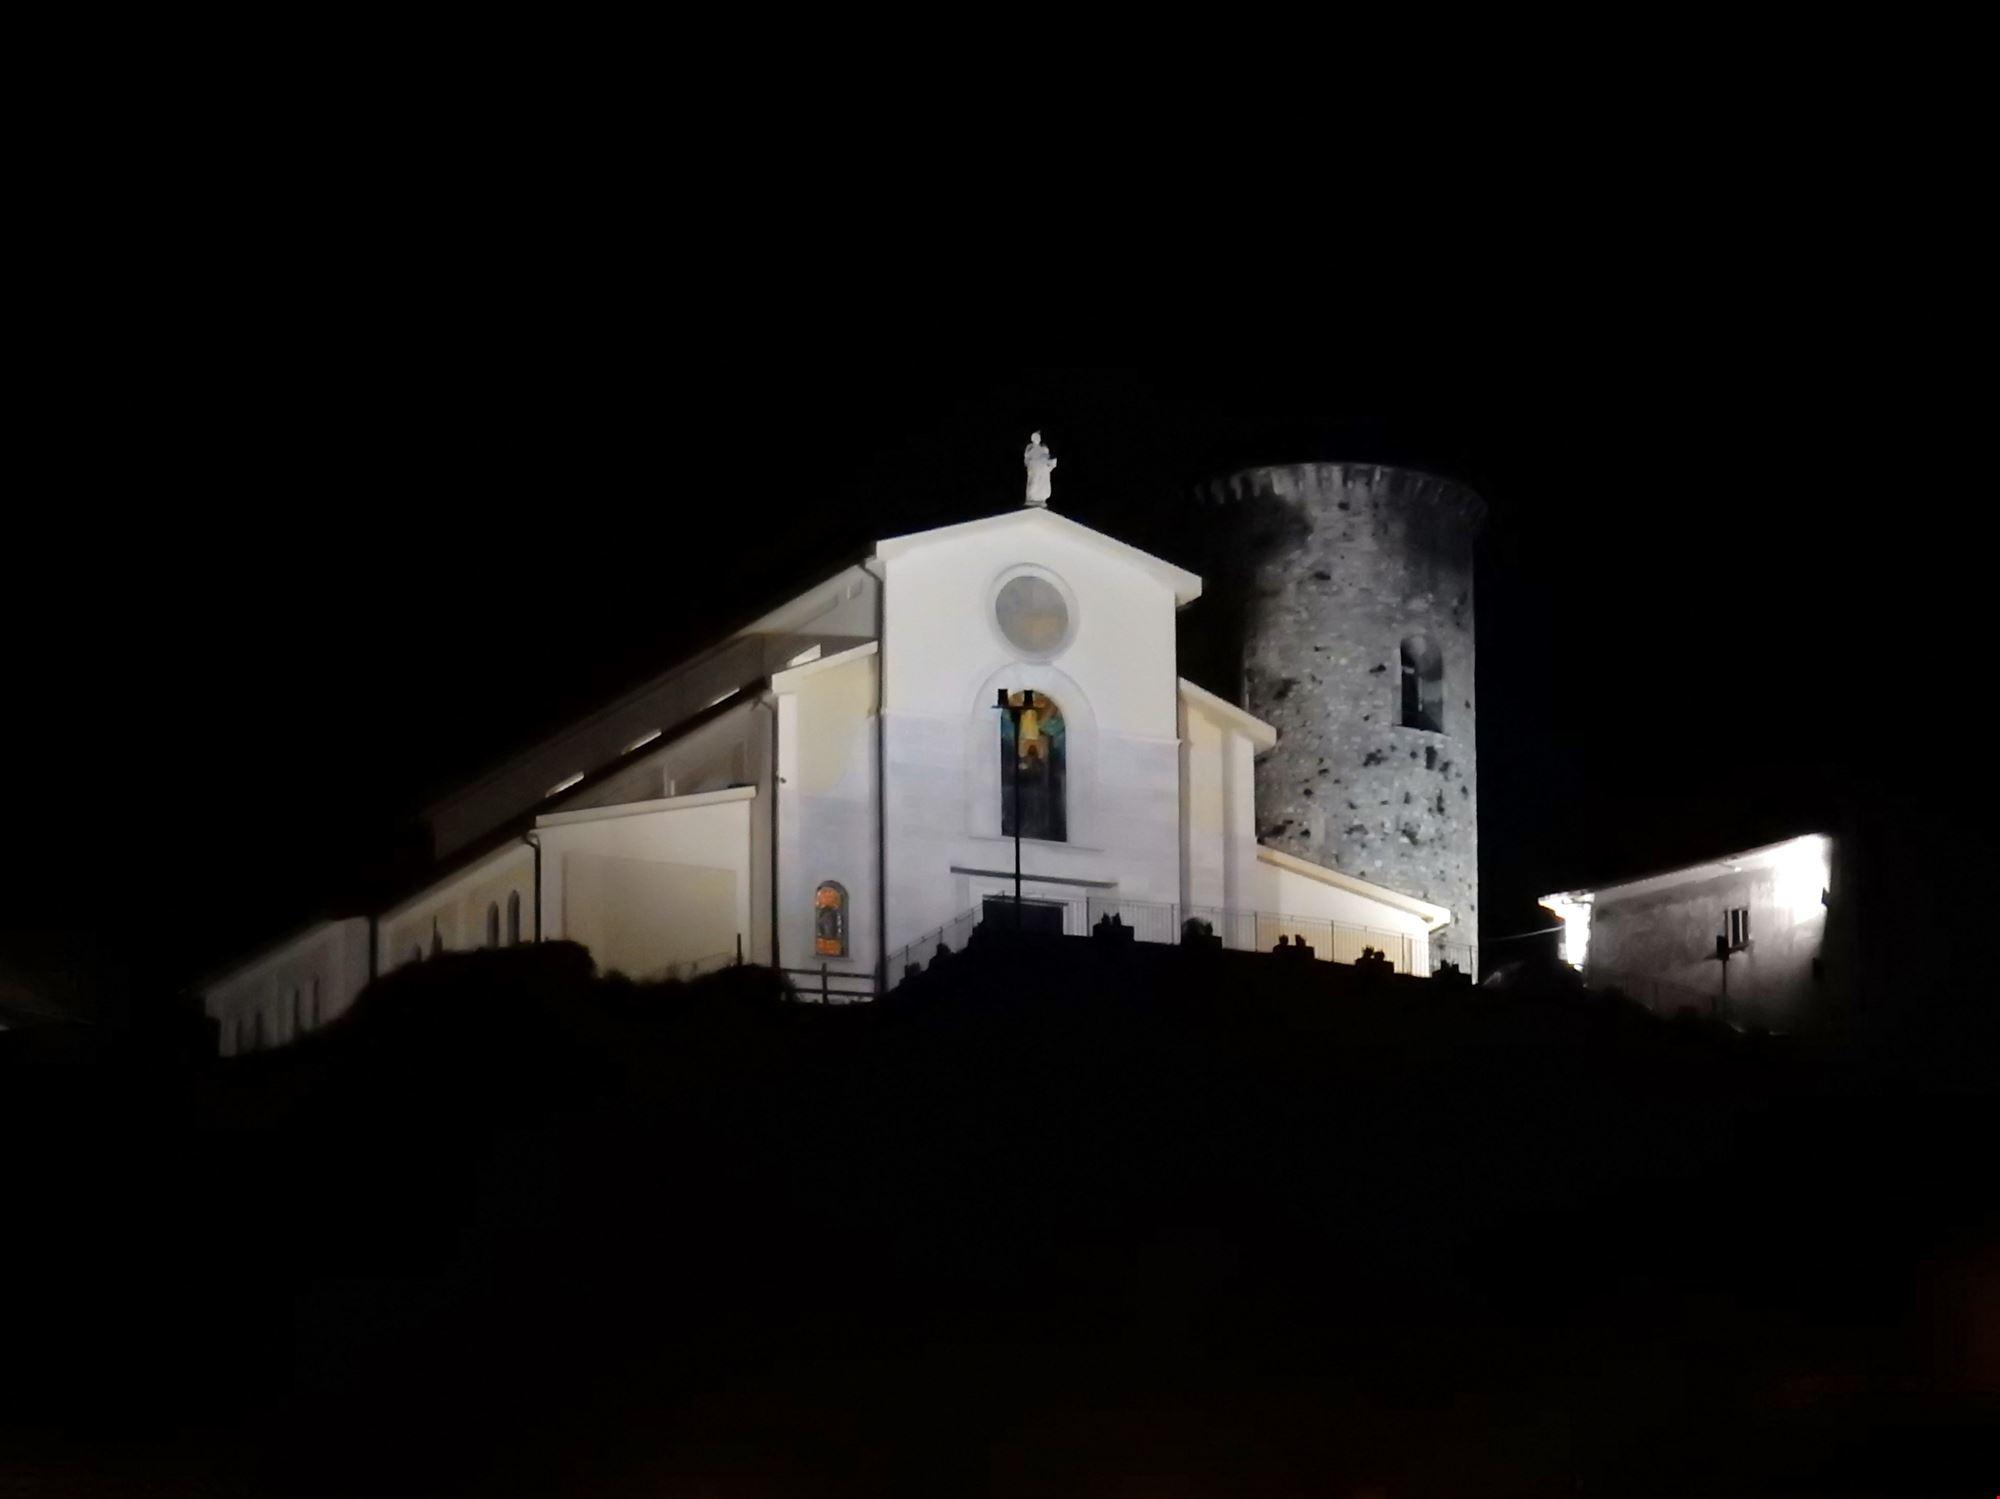 San Marco dei Cavoti